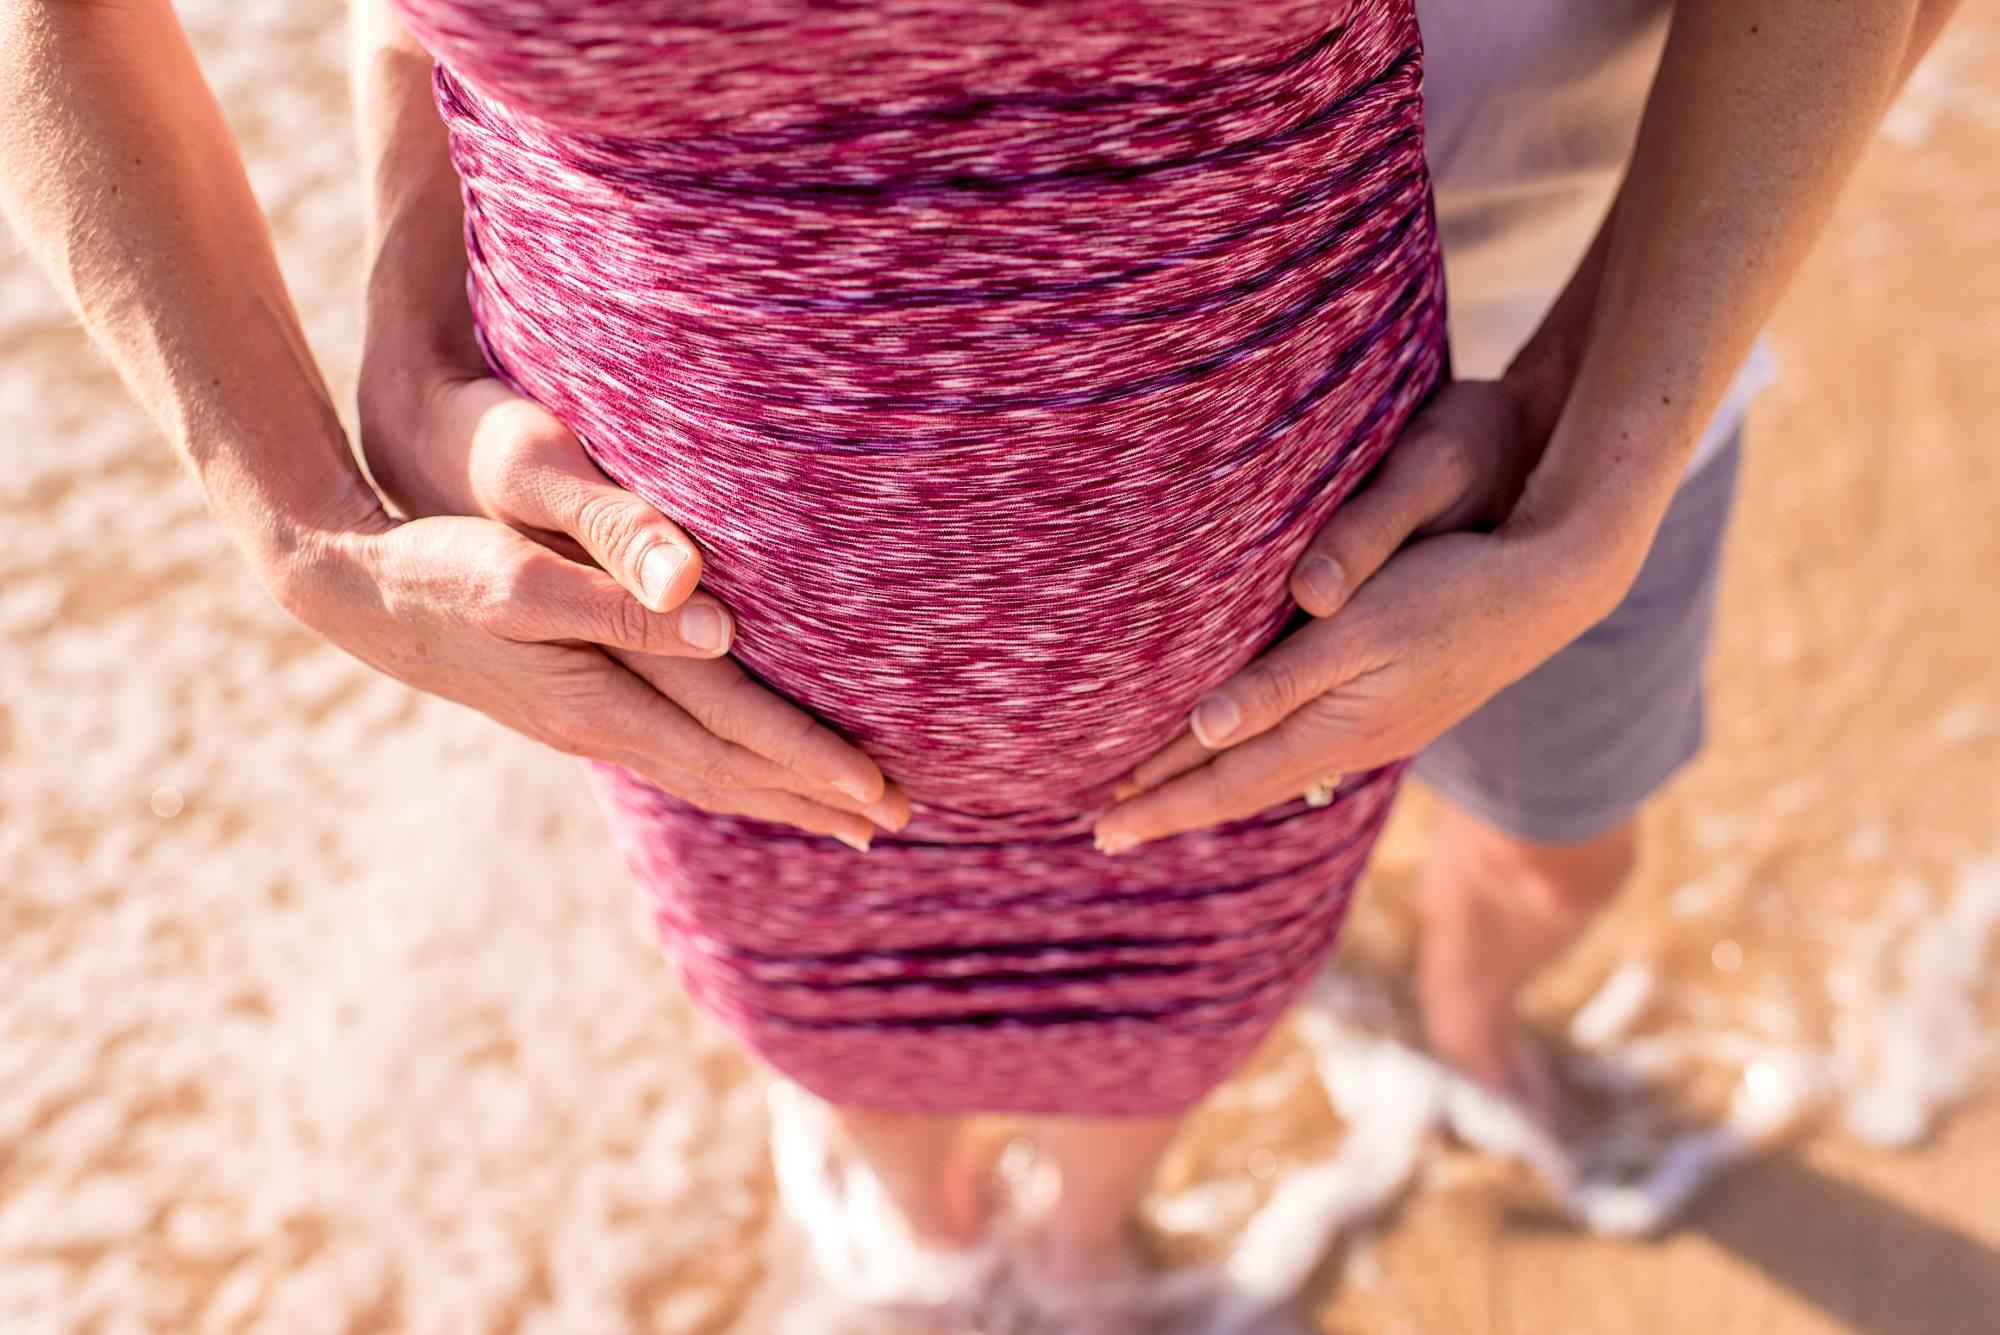 belly shot 25 weeks pregnant